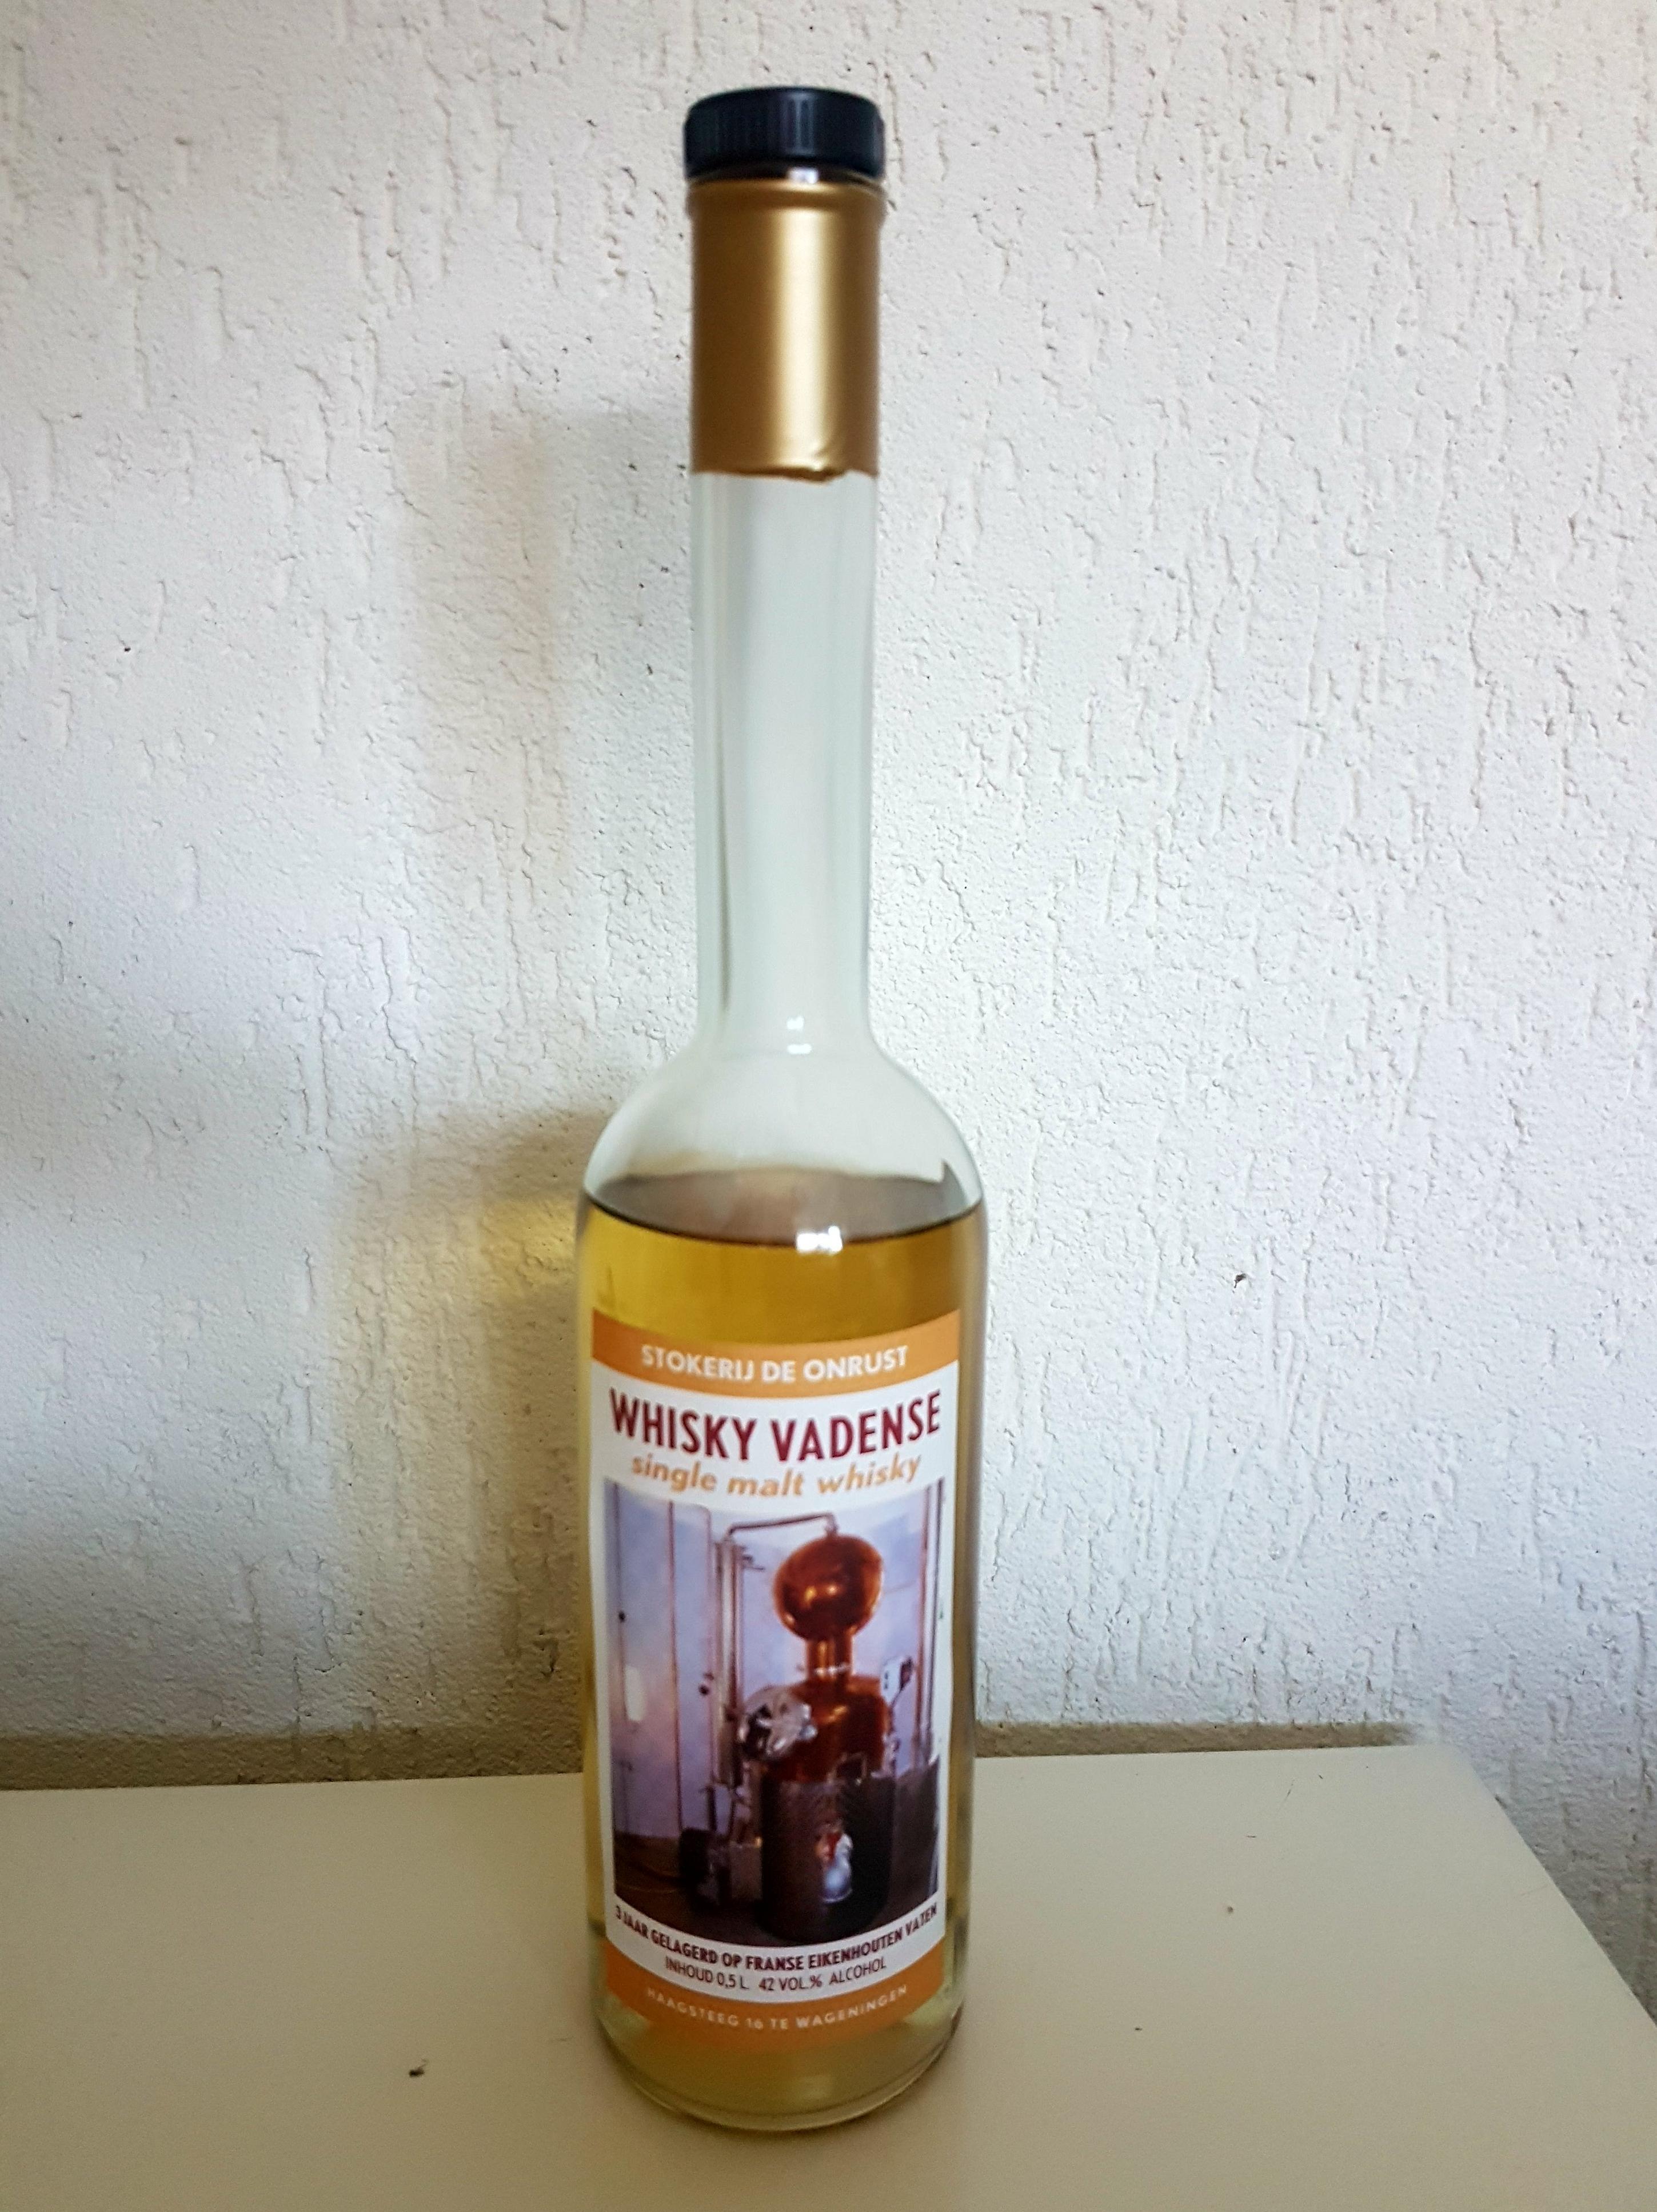 Whisky Vadense